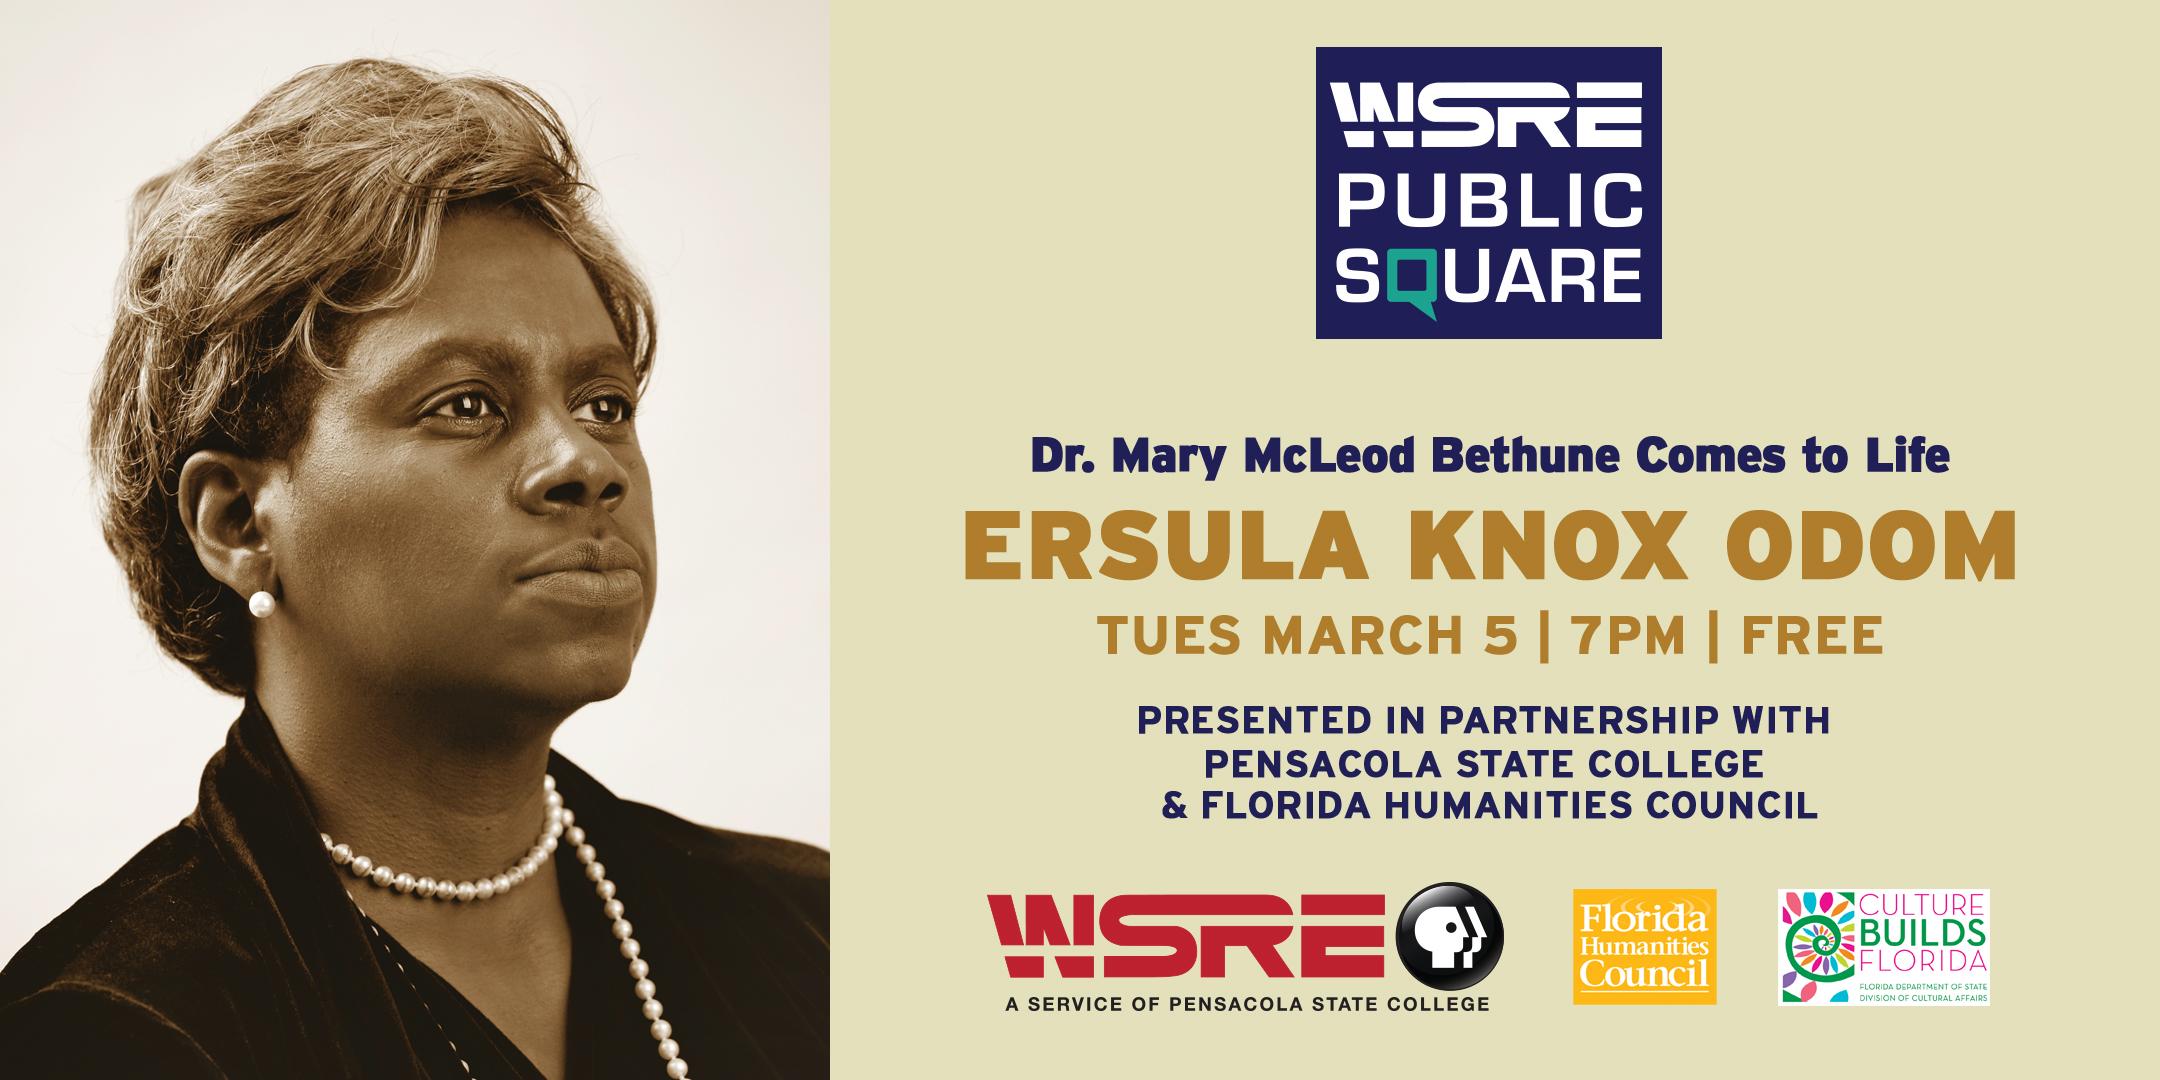 Ersula Knox Odom: Dr. Mary McLeod Bethune Comes to Life